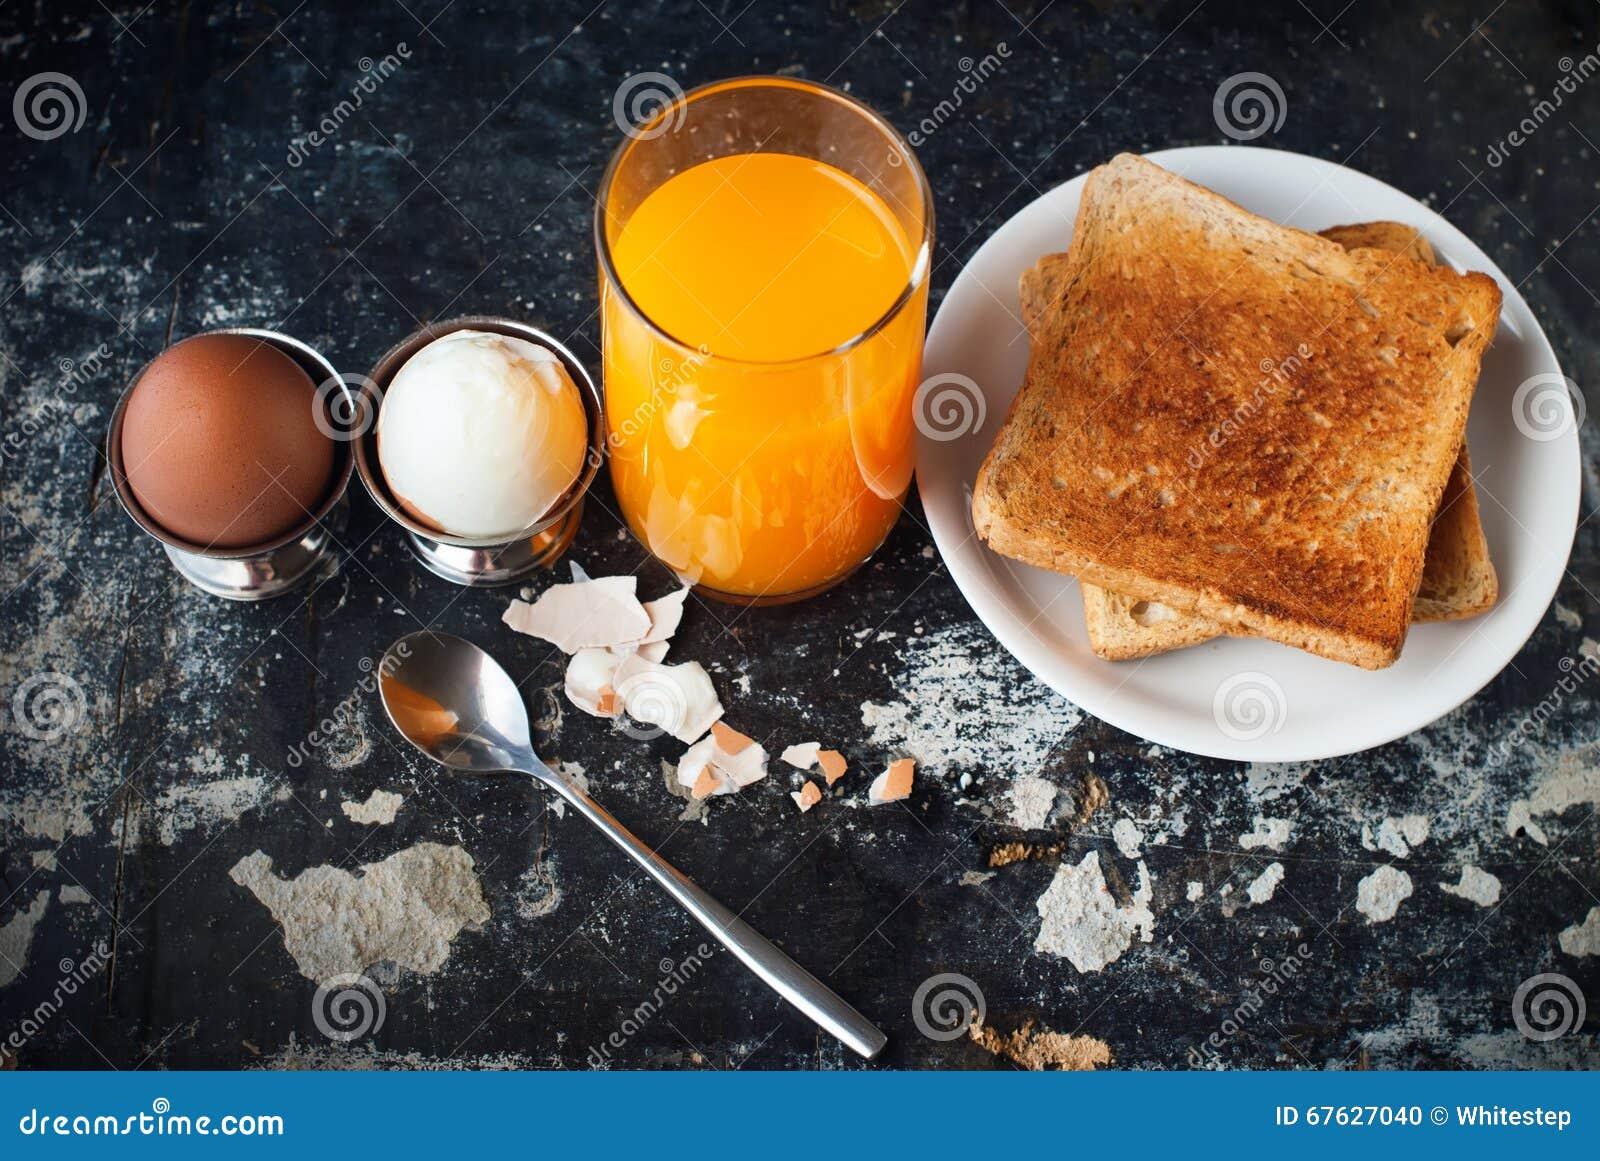 Tabella arancio di juice toasts spoon rustic shabby degli uova sode